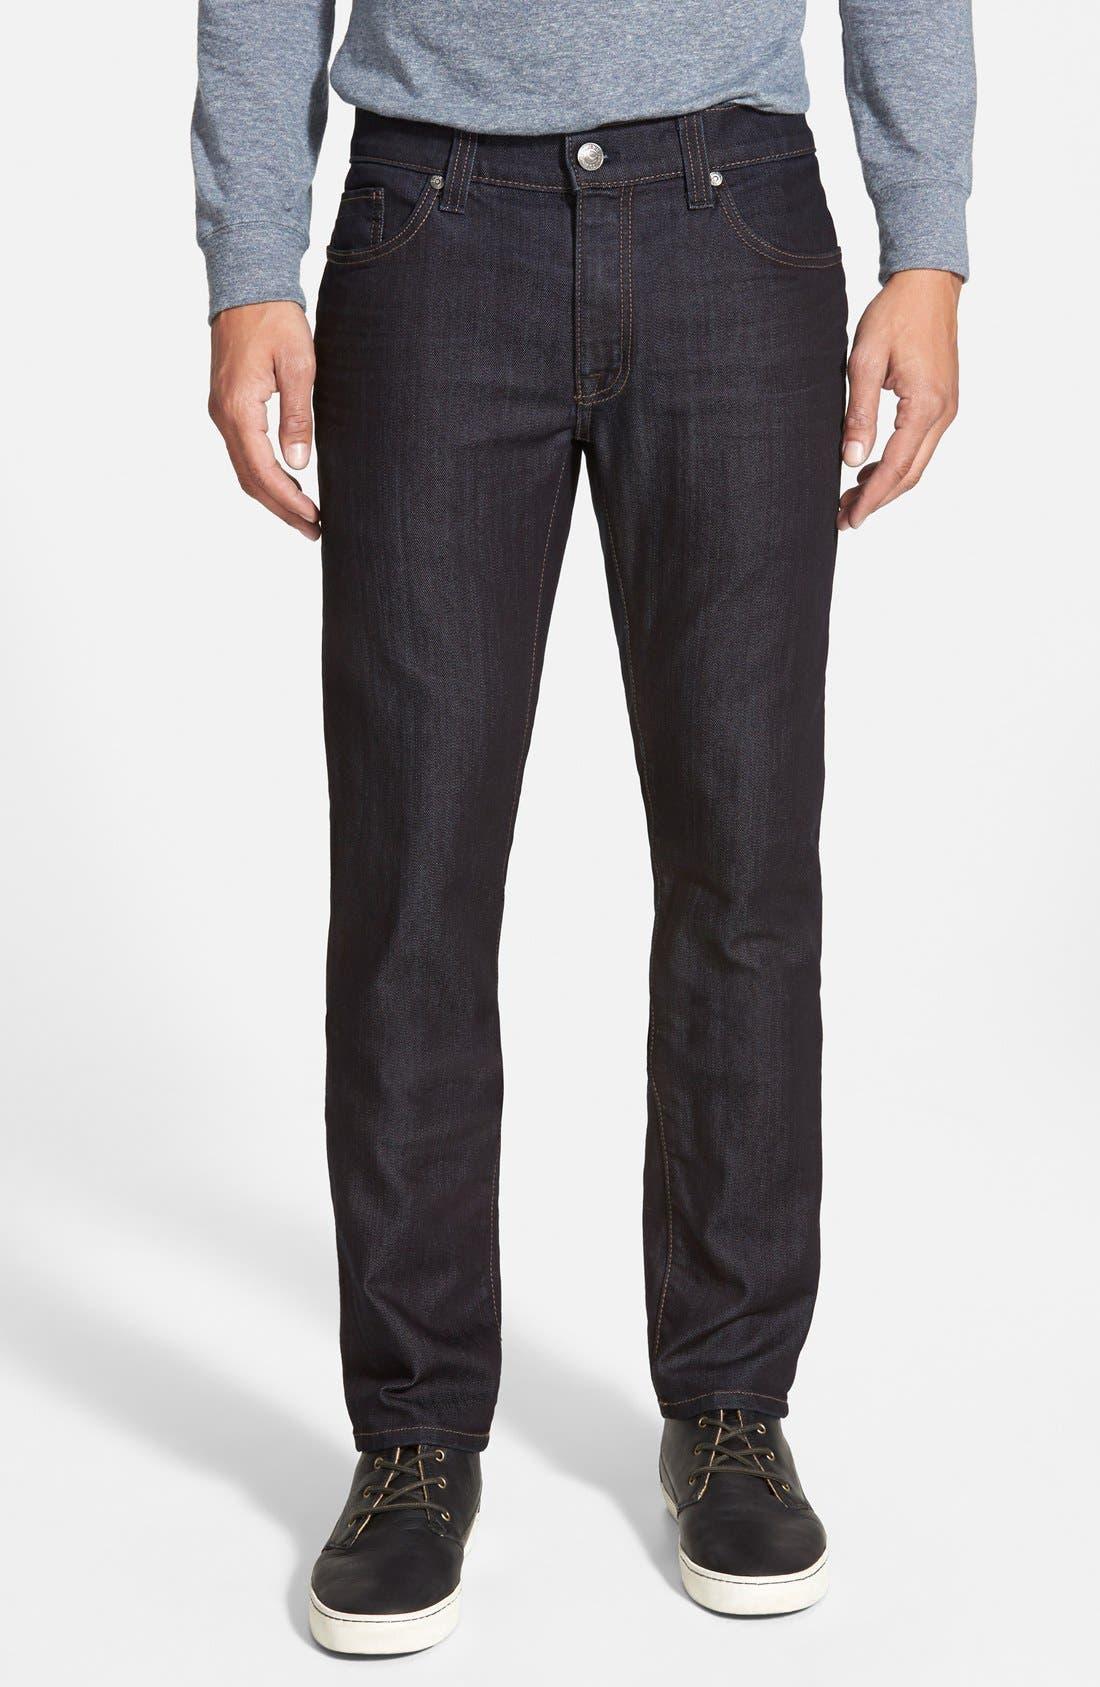 Torino Slim Fit Jeans,                             Main thumbnail 1, color,                             REVOLUTION RINSE